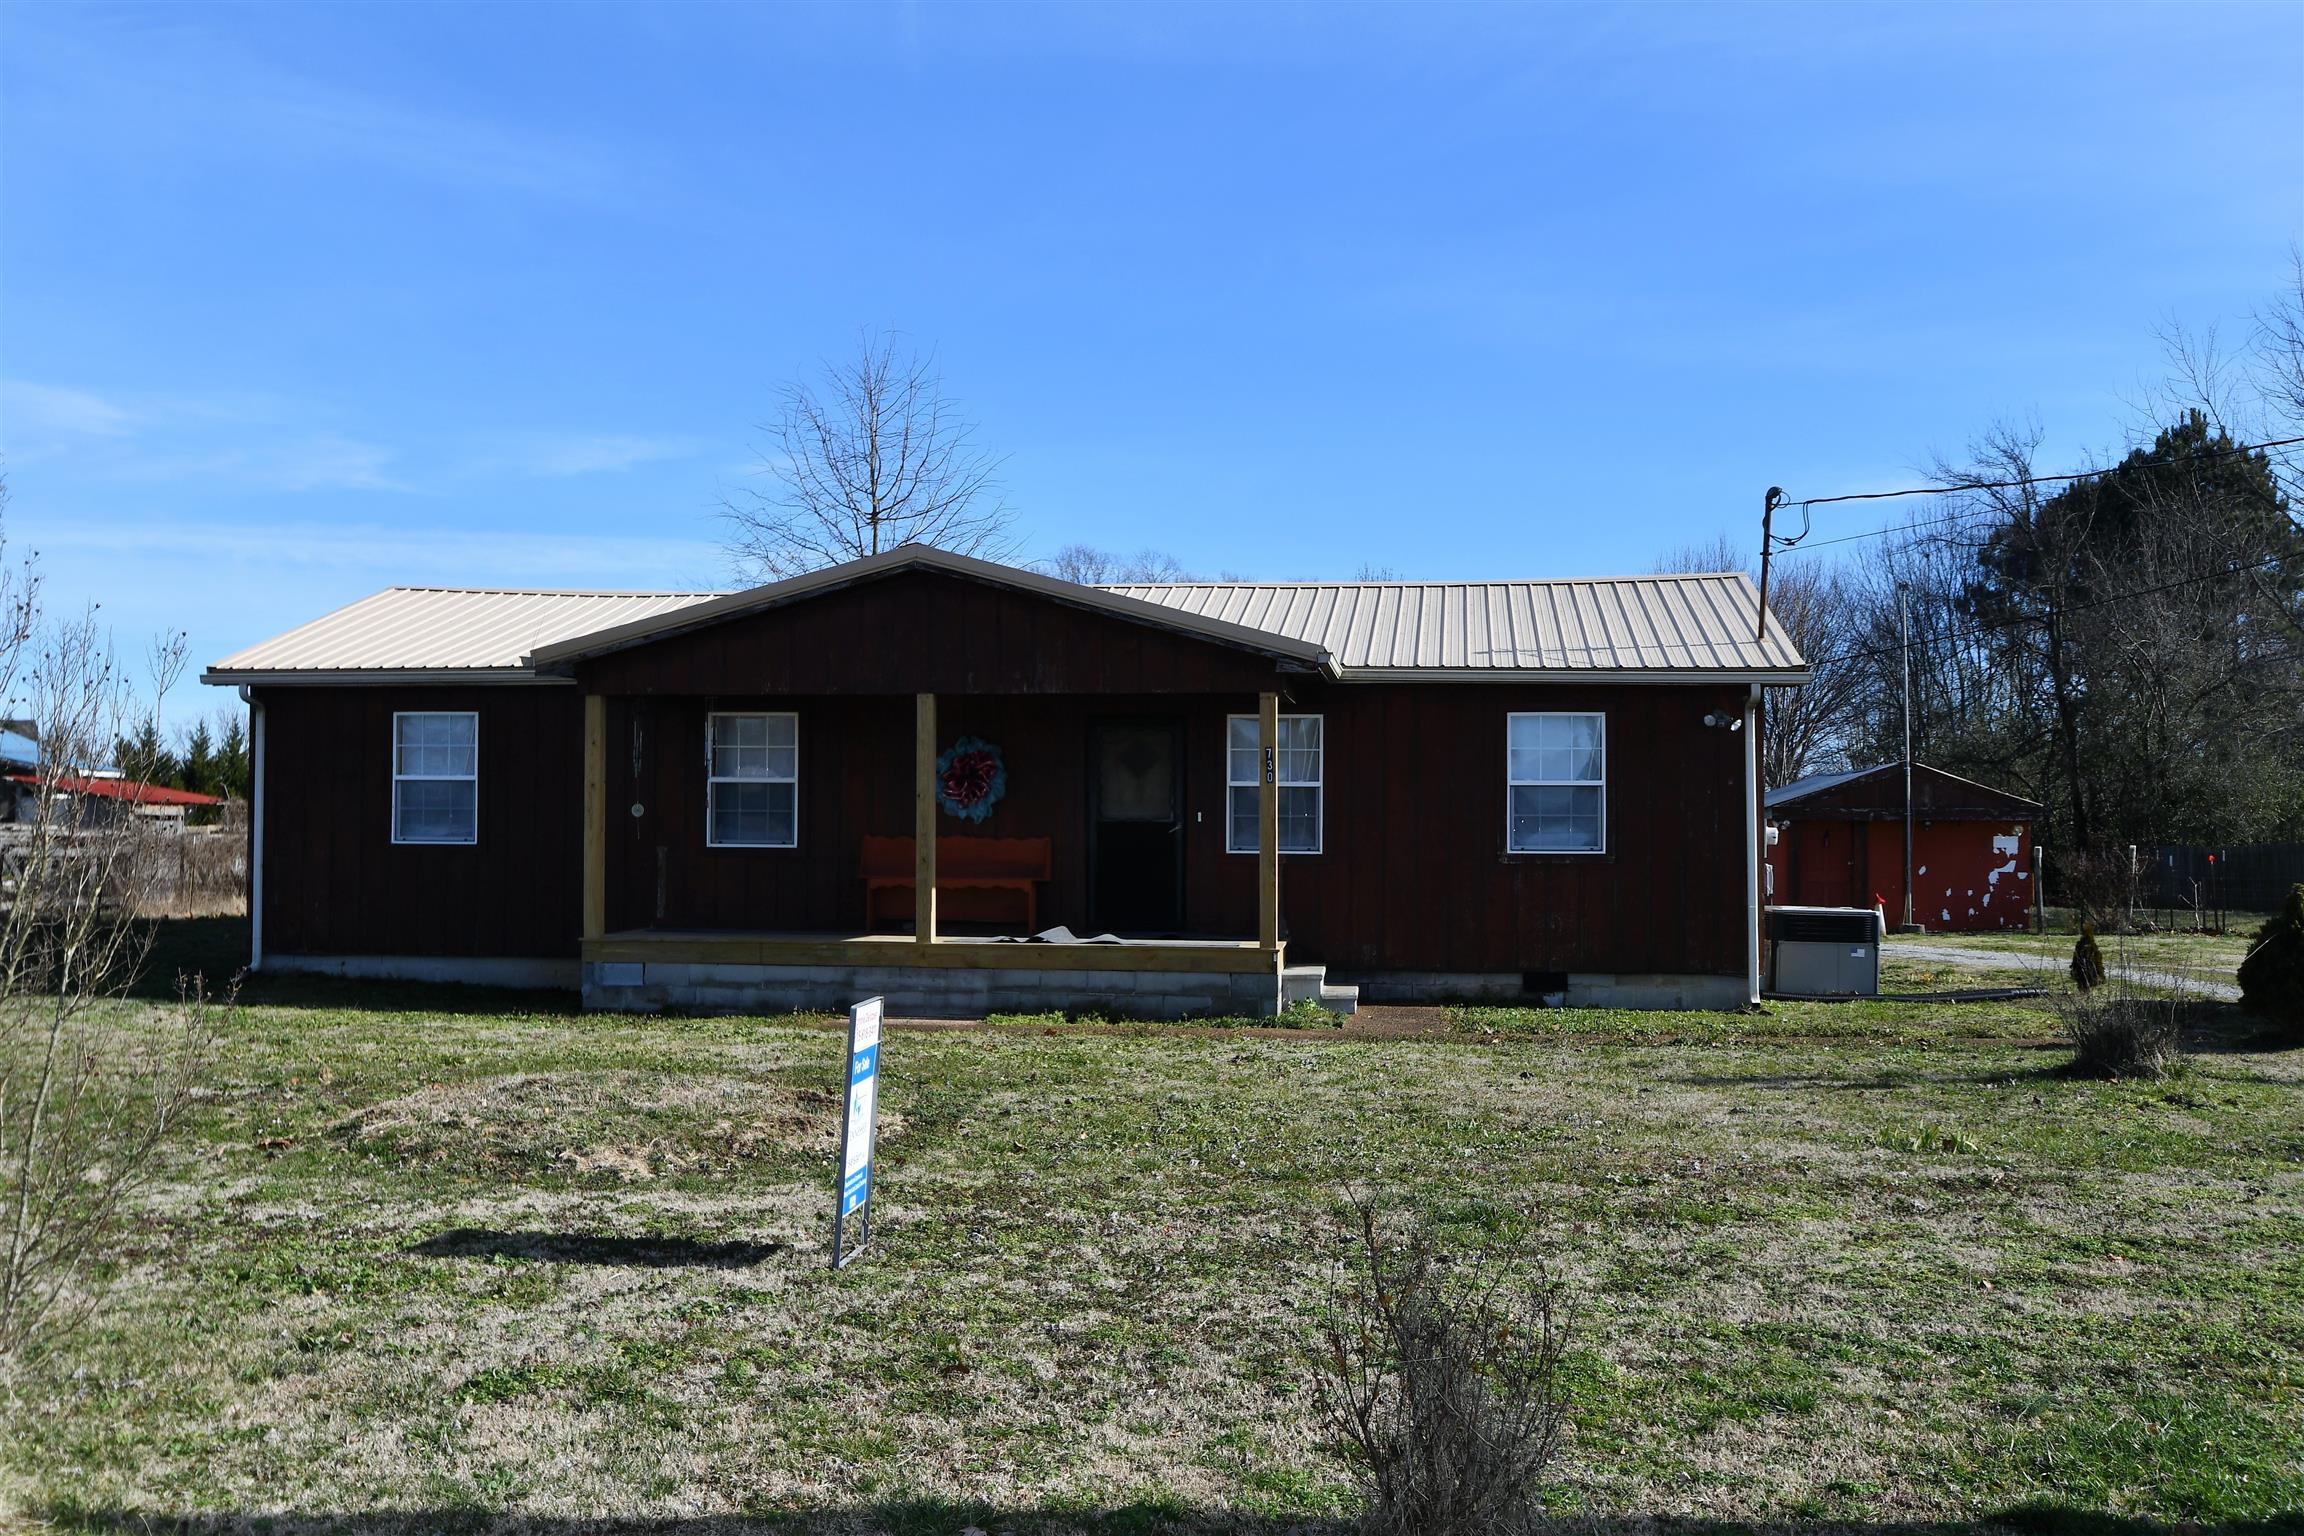 730 Monument Rd, Summertown, TN 38483 - Summertown, TN real estate listing